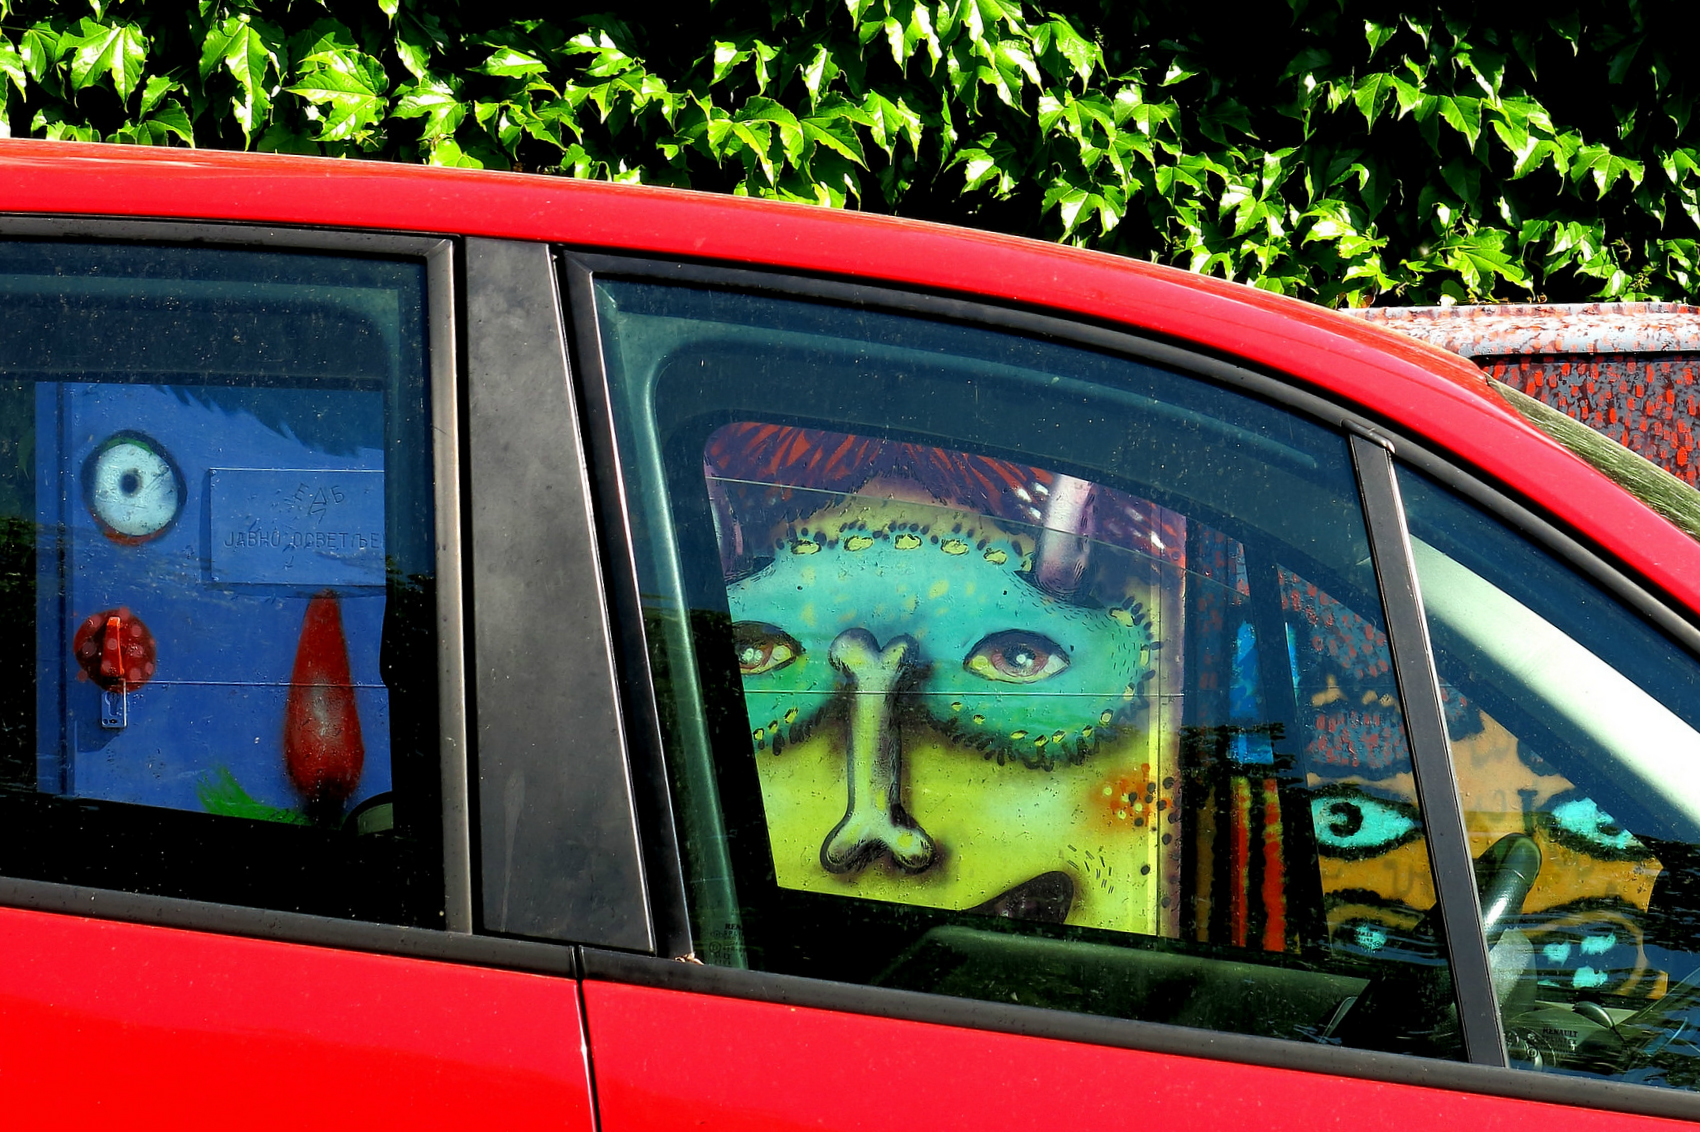 граффити стрит-арт муралы белград сербия